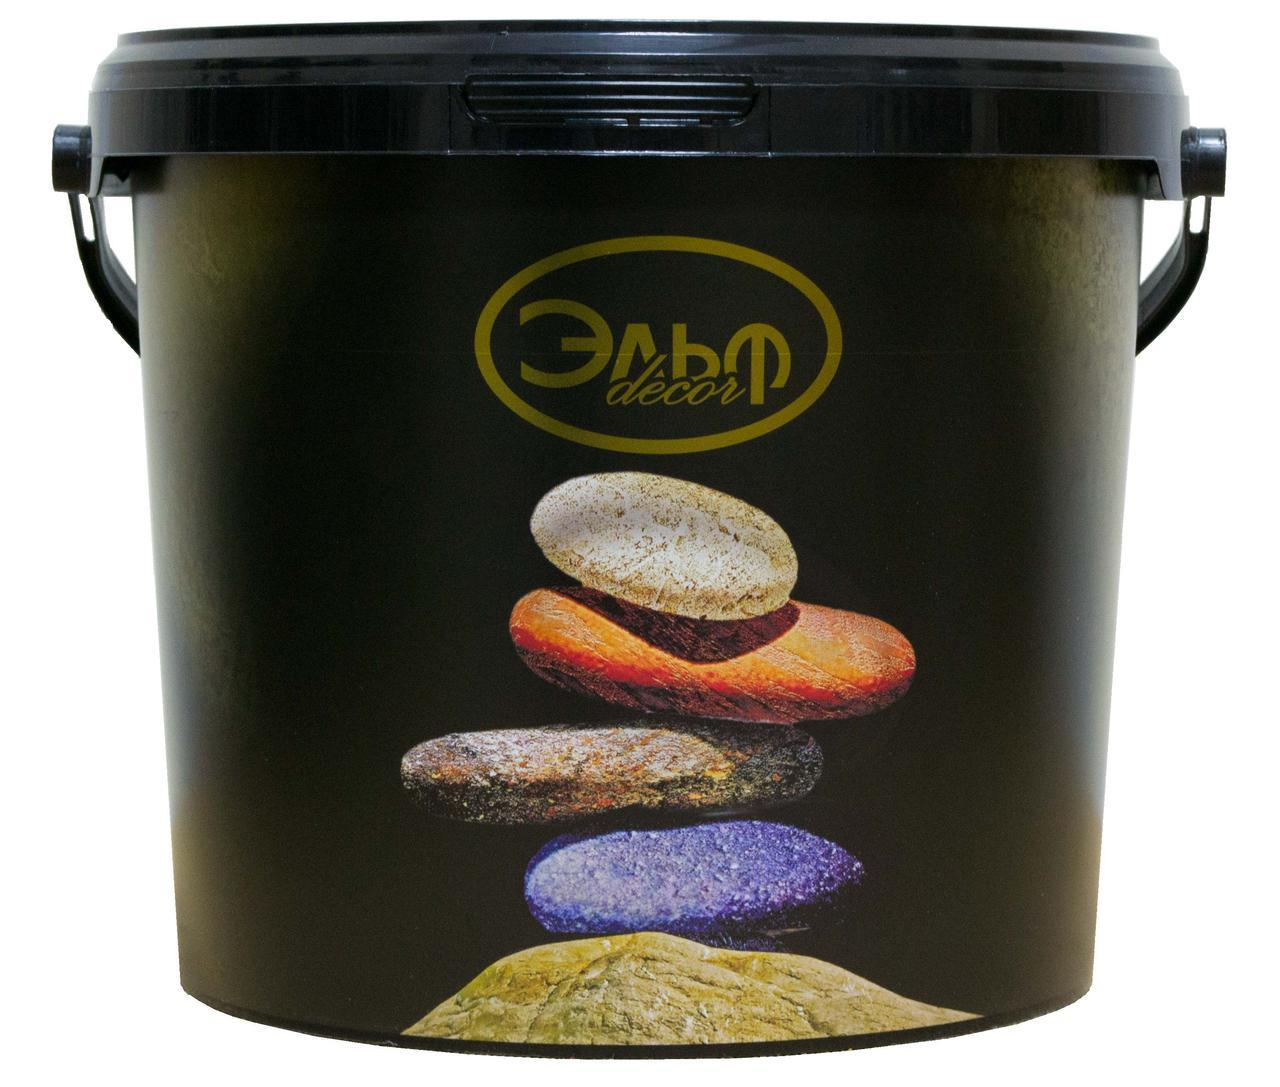 SAHARA Premium (Сахара Премиум), Эльф, декоративное покрытие, 5кг